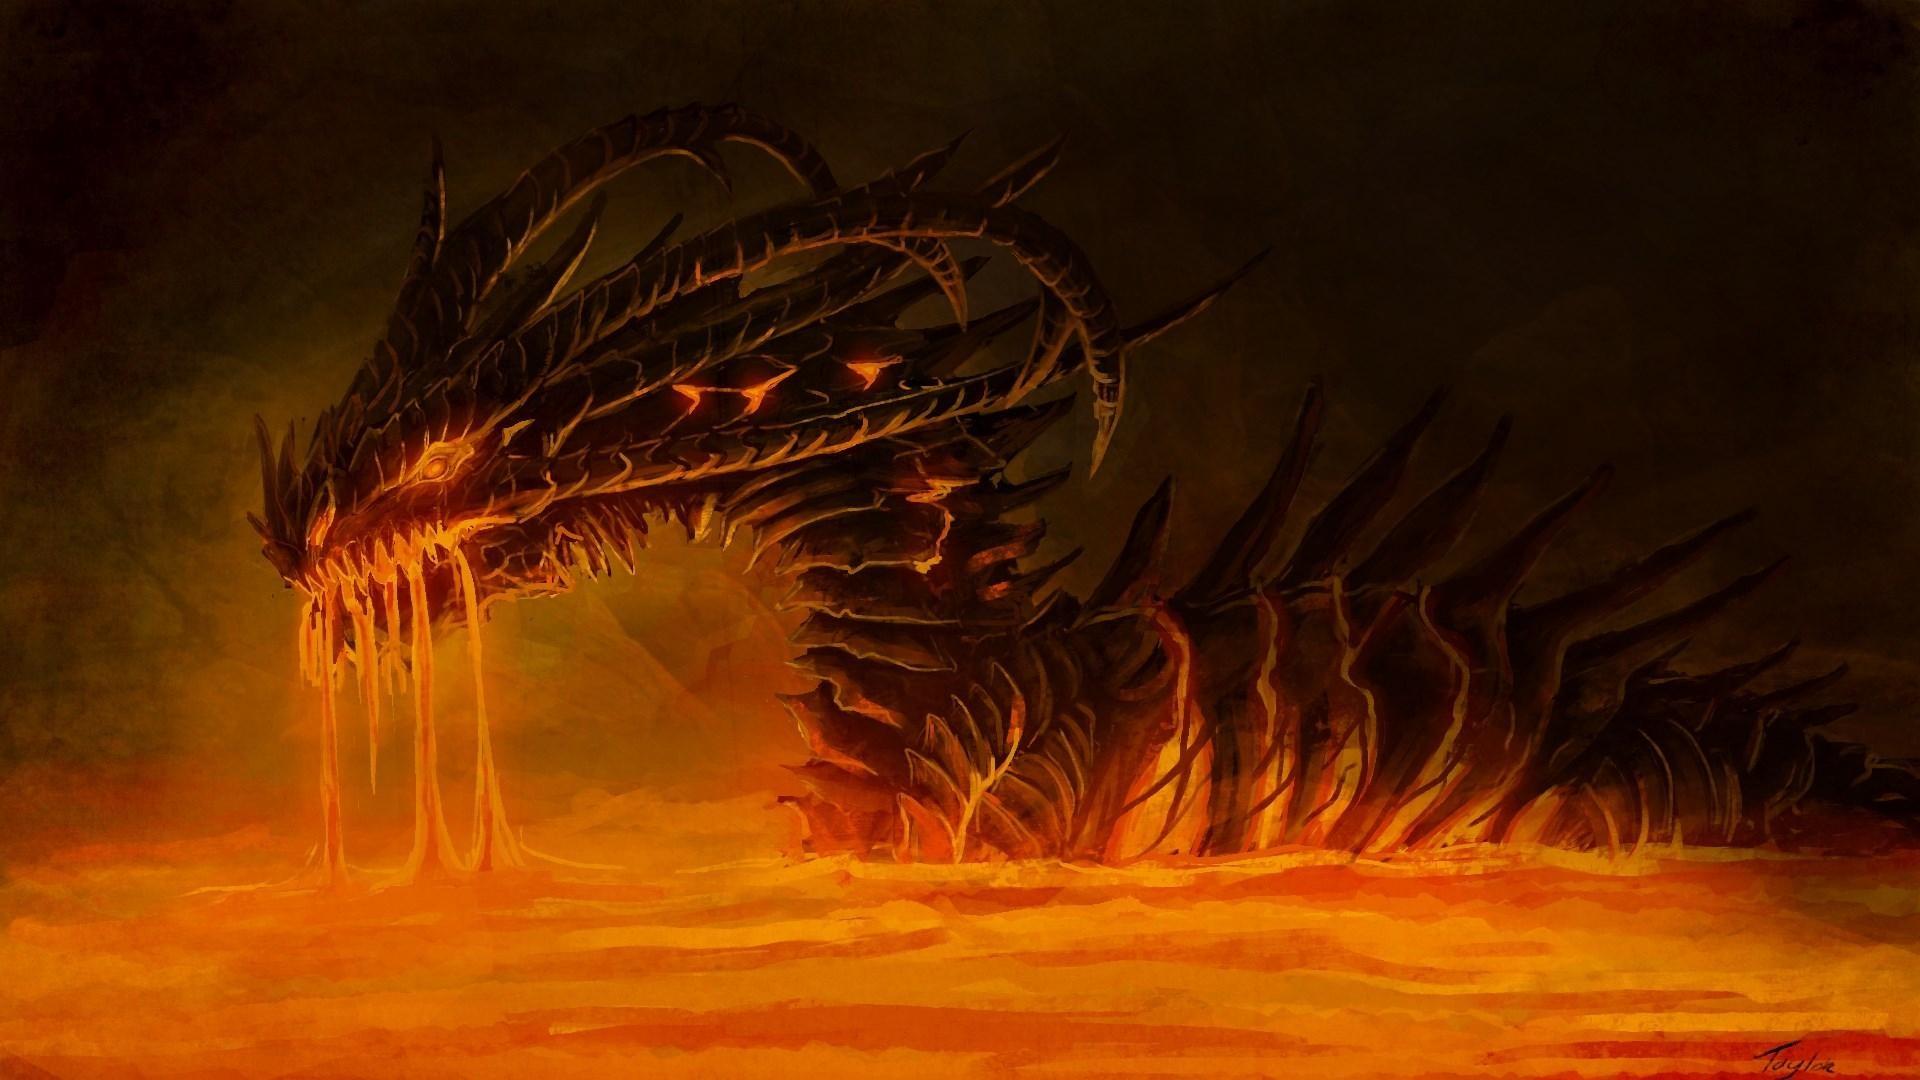 Dragon Wallpaper HD 1080p (76+ images)